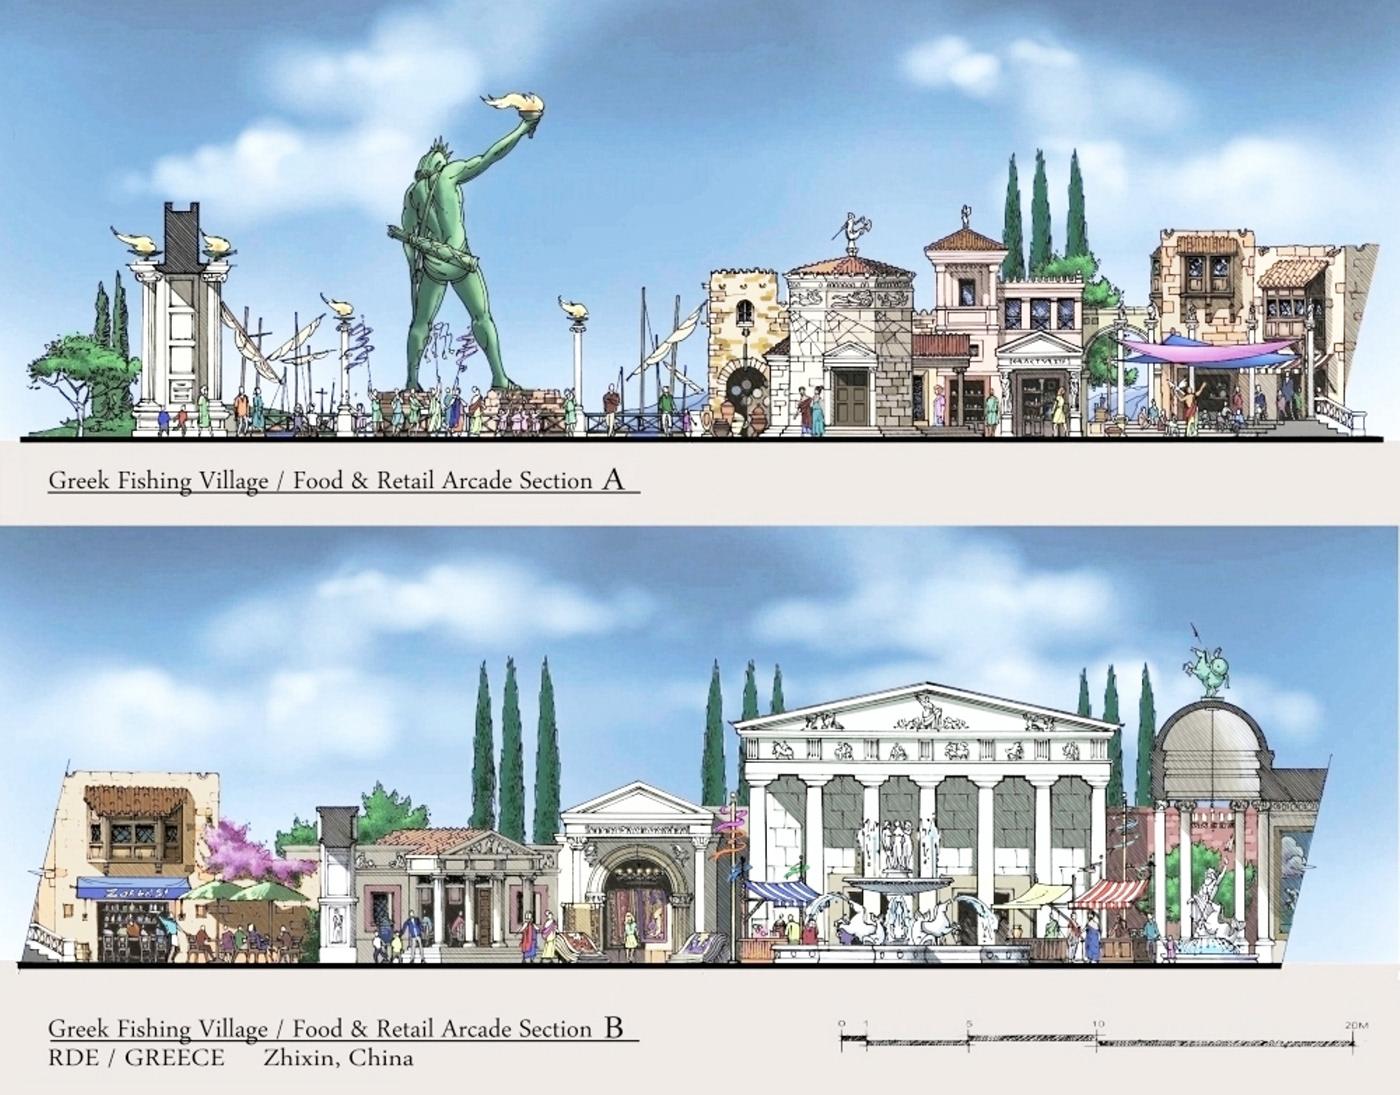 disney Walt Disney Imagineering Theme Park themepark amusement park restaurant themed restaurant show building themed architecture Elevation theme architecture disneysea disney sea dreamworld